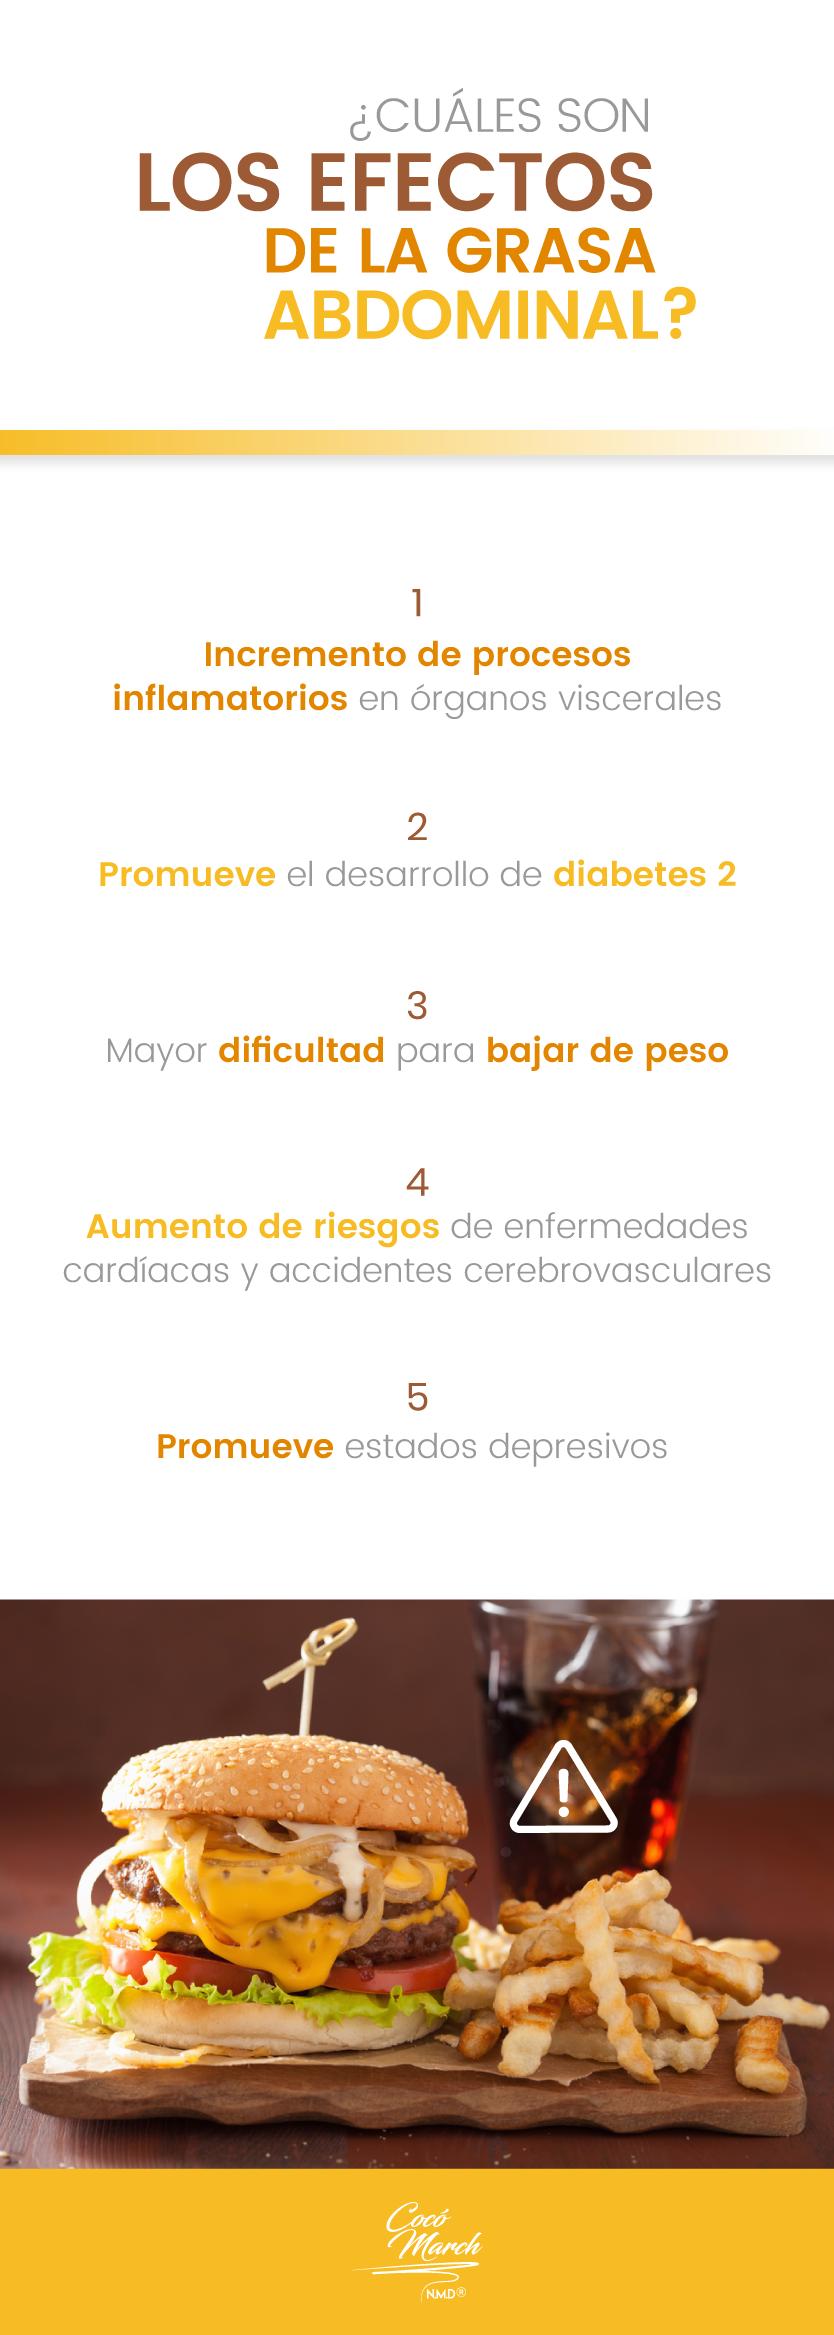 efectos-grasa-abdominal